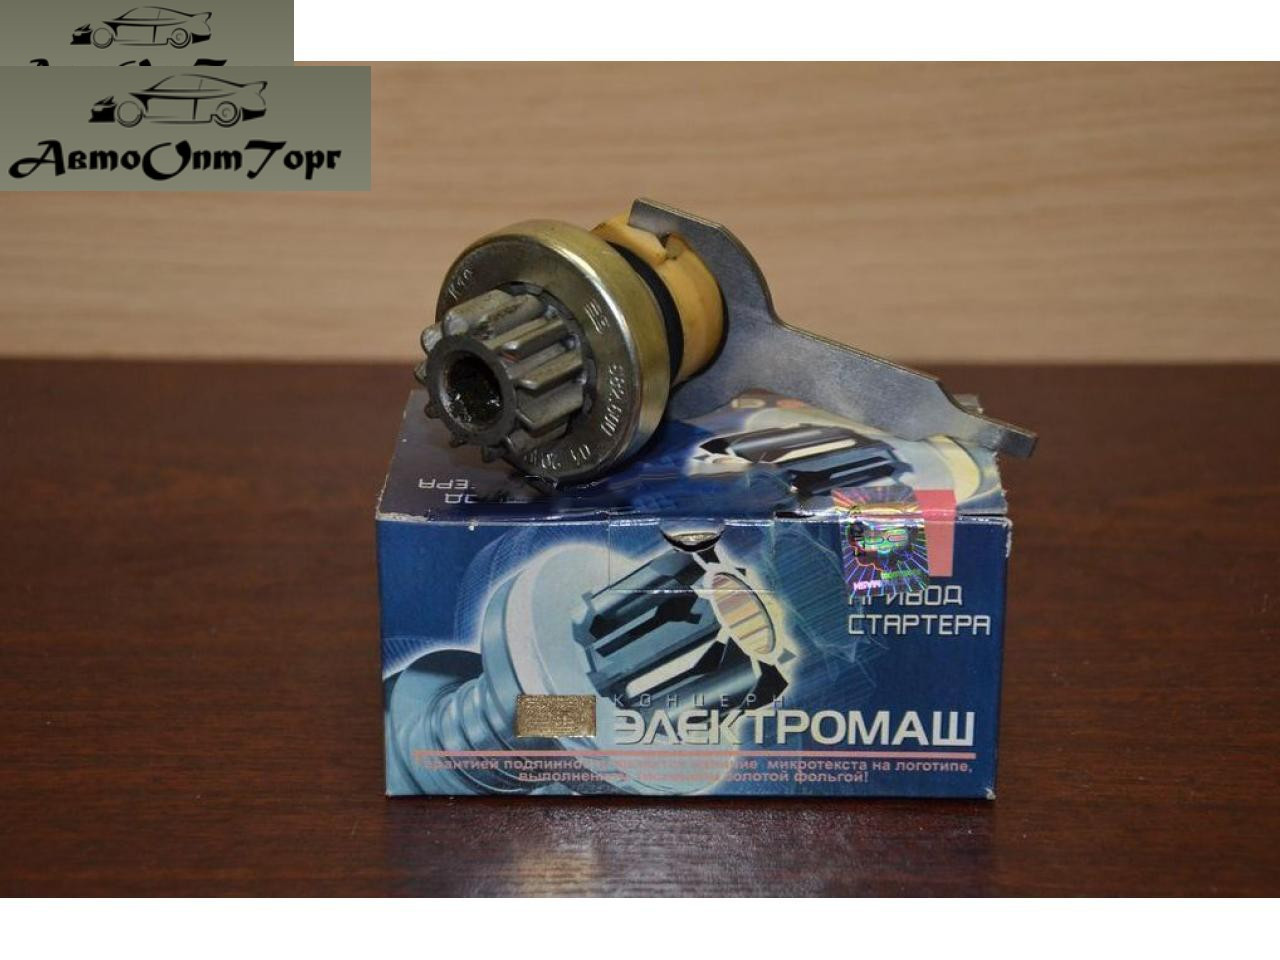 Привод стартера ВАЗ 2108, 2109, 21099, (бендикс) херсонский стартер постоянных магнитах, 582.600, Электромаш,